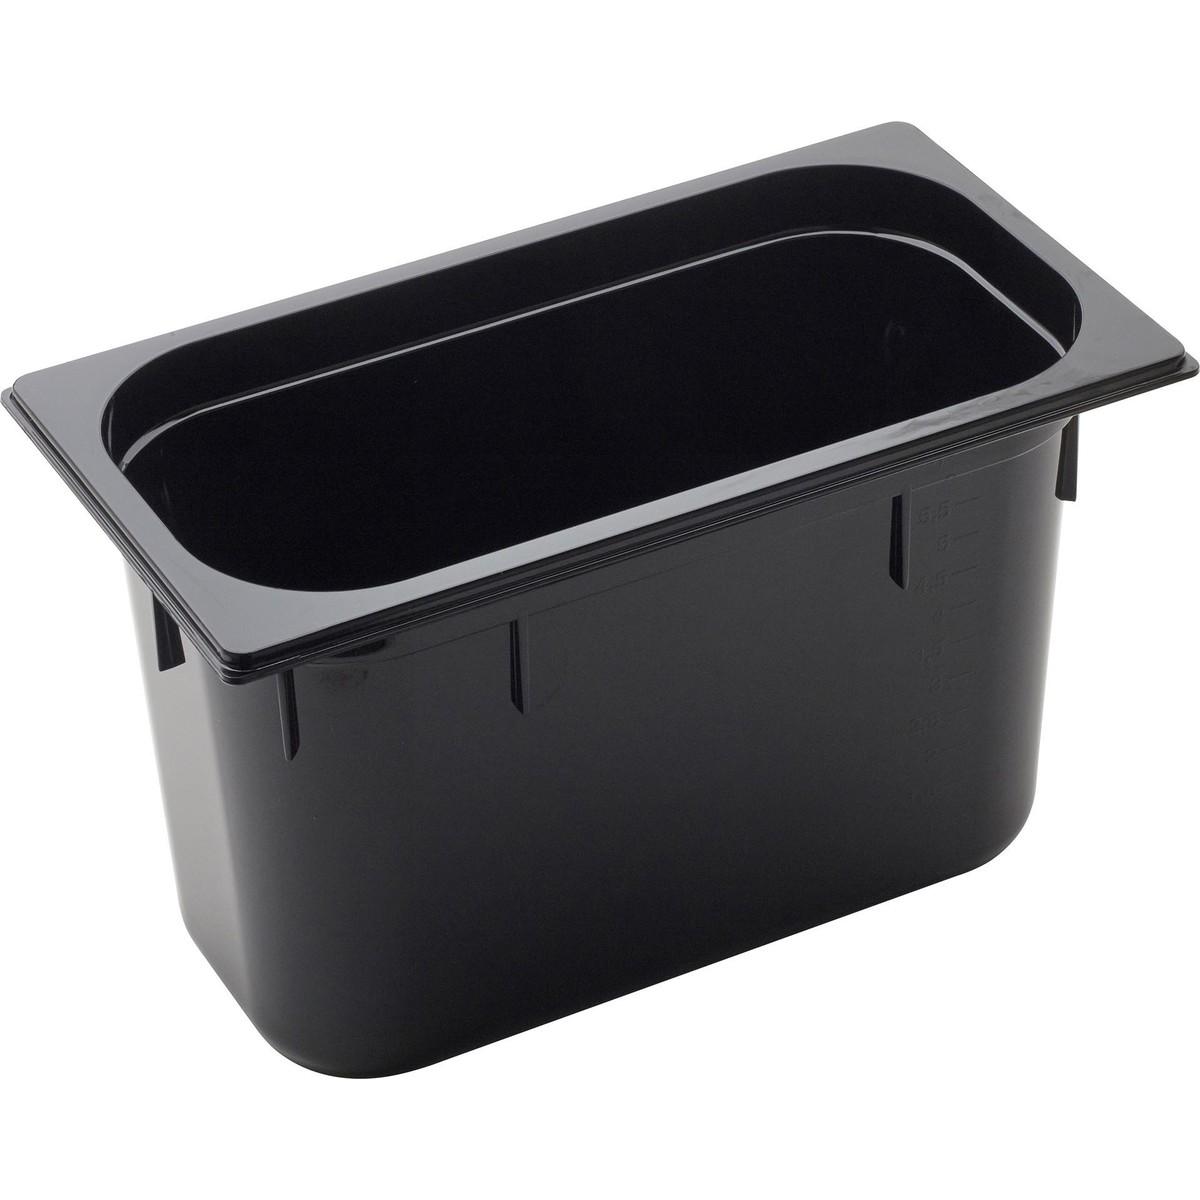 GN Behälter 1/3 Polycarbonat schwarz T: 200mm, 9L